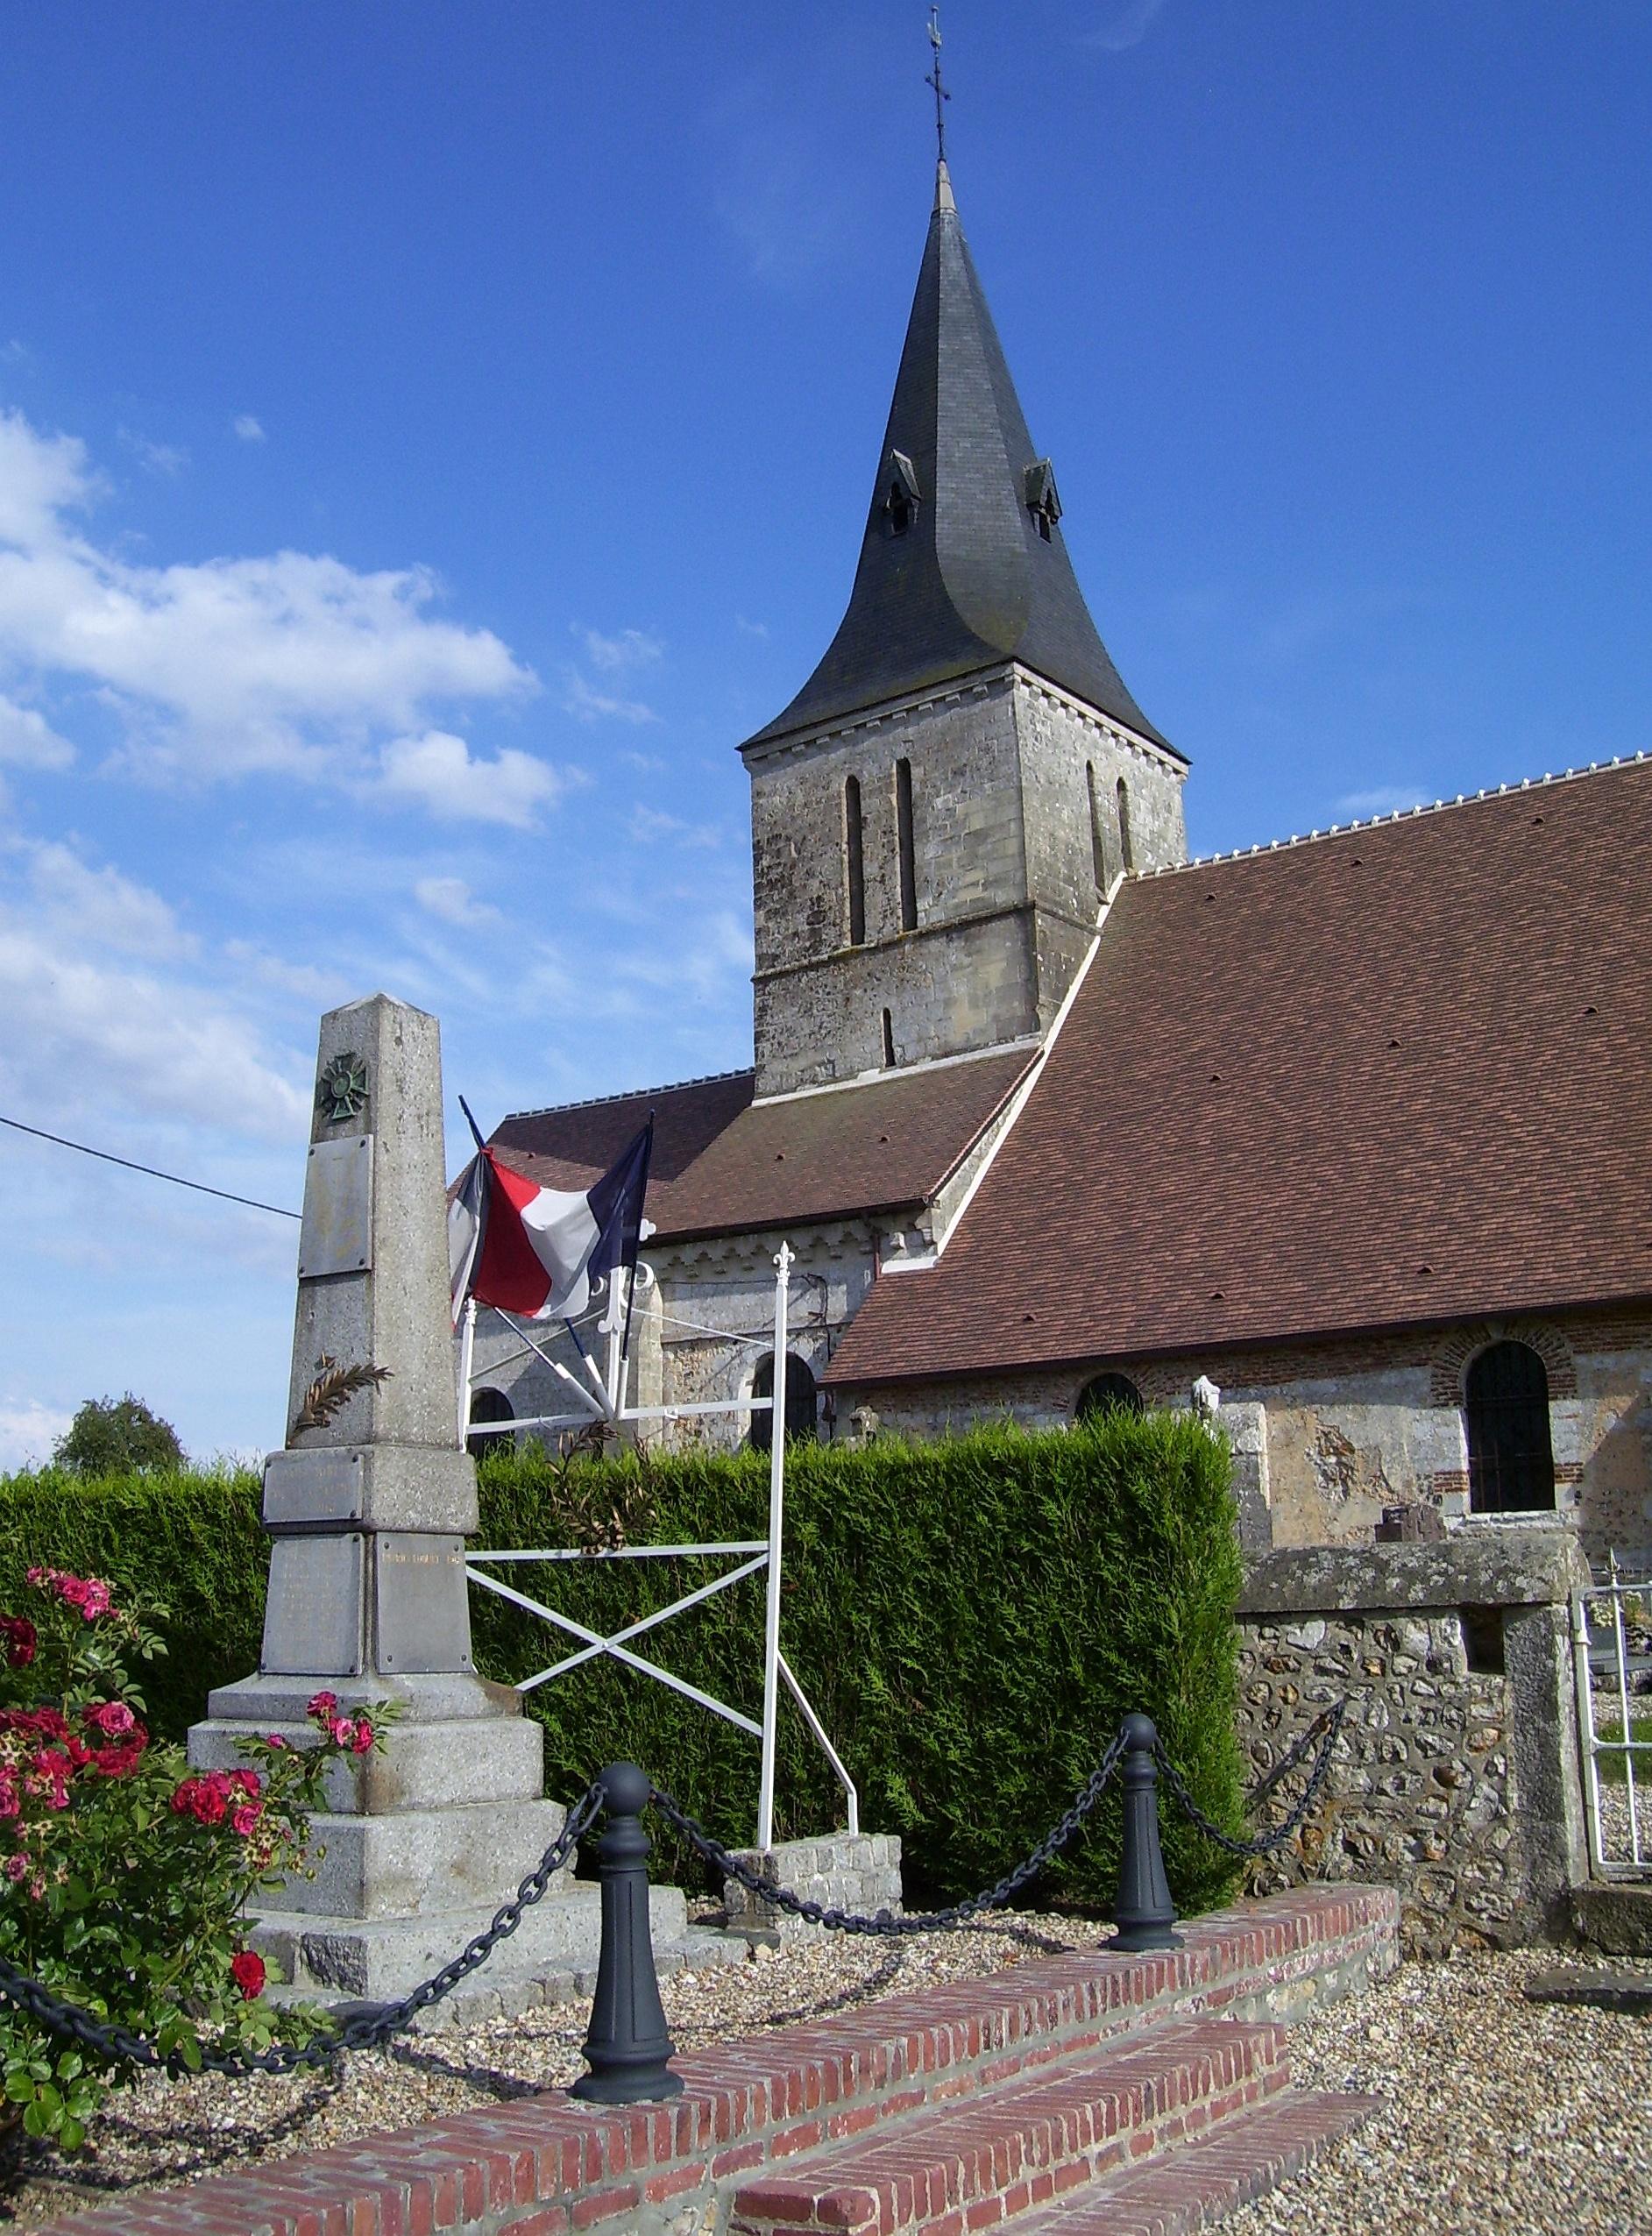 Kriegerdenkmal vor der Kirche, eigenes Foto, Lizenz: public domain/gemeinfrei